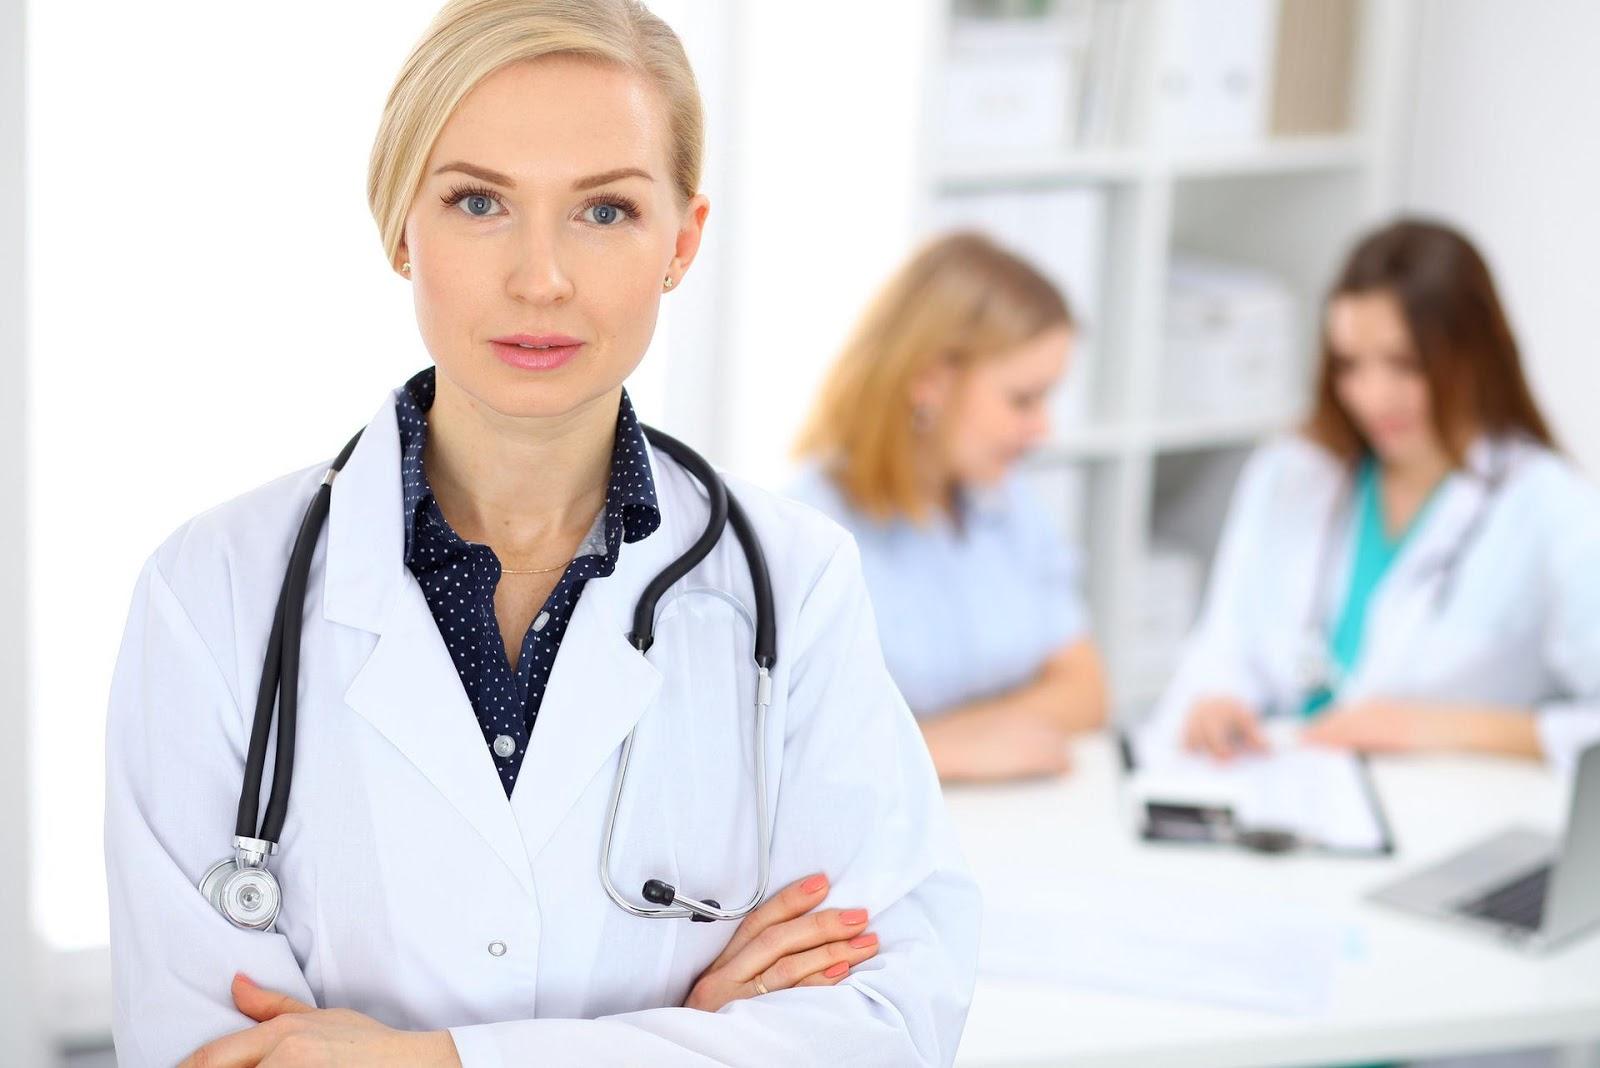 Картинка для врачей девушки